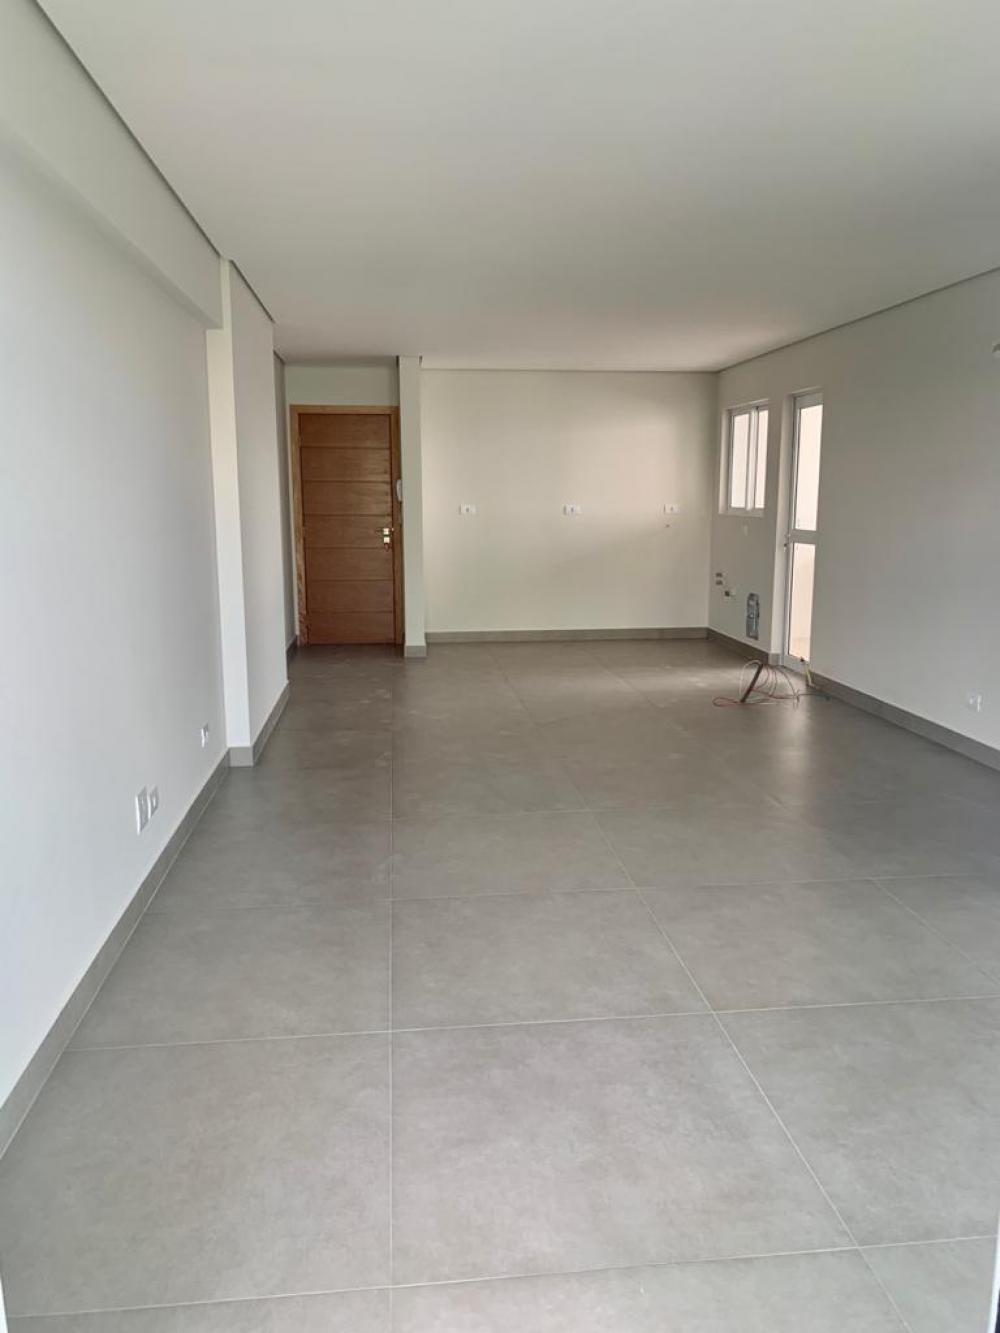 Maringa Apartamento Venda R$520.000,00 3 Dormitorios 1 Suite Area construida 89.00m2